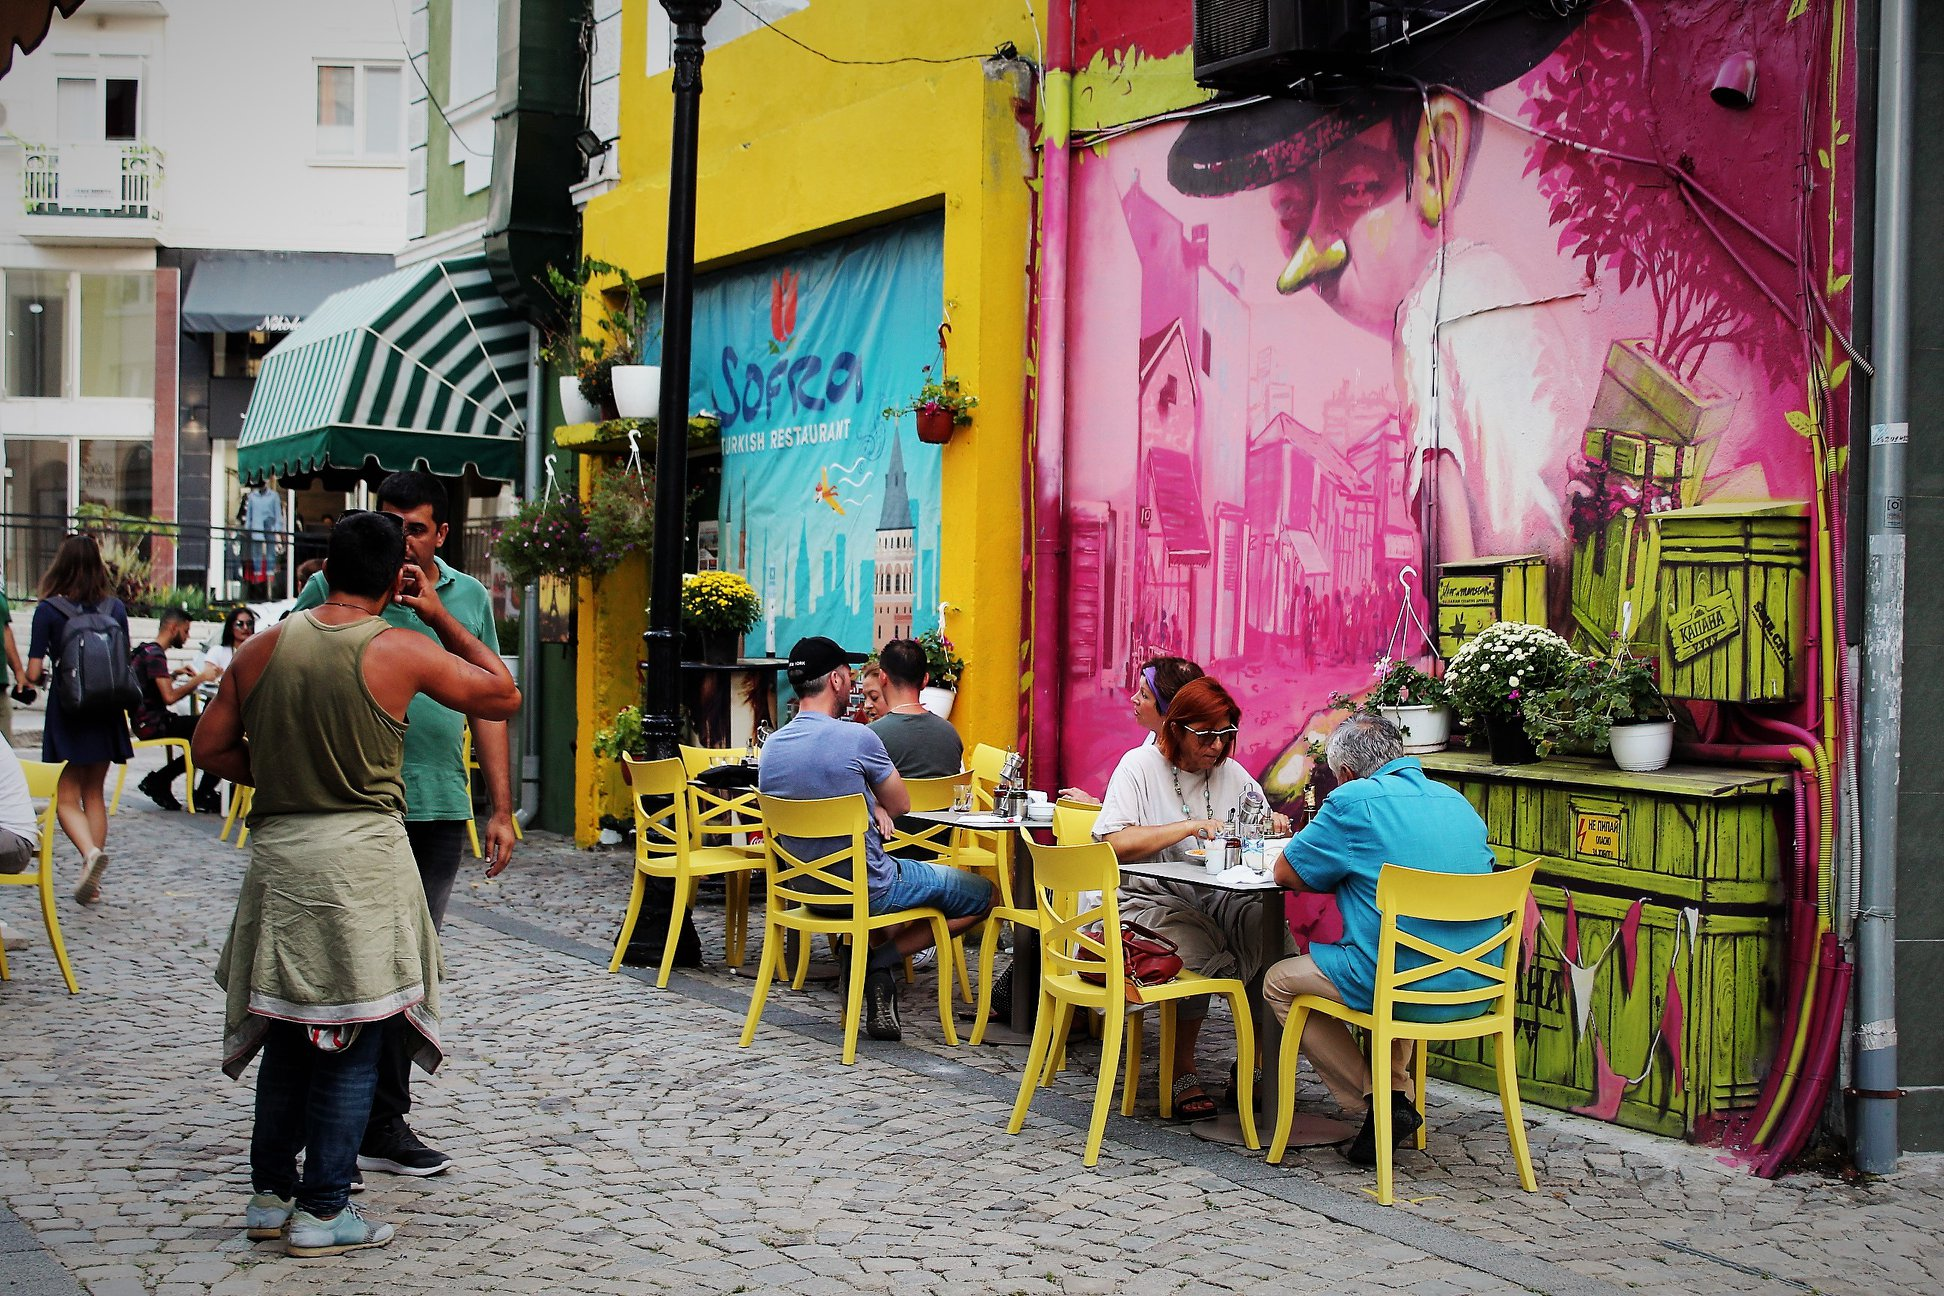 Restaurants und Cafes in Plovdiv (Bulgarien)